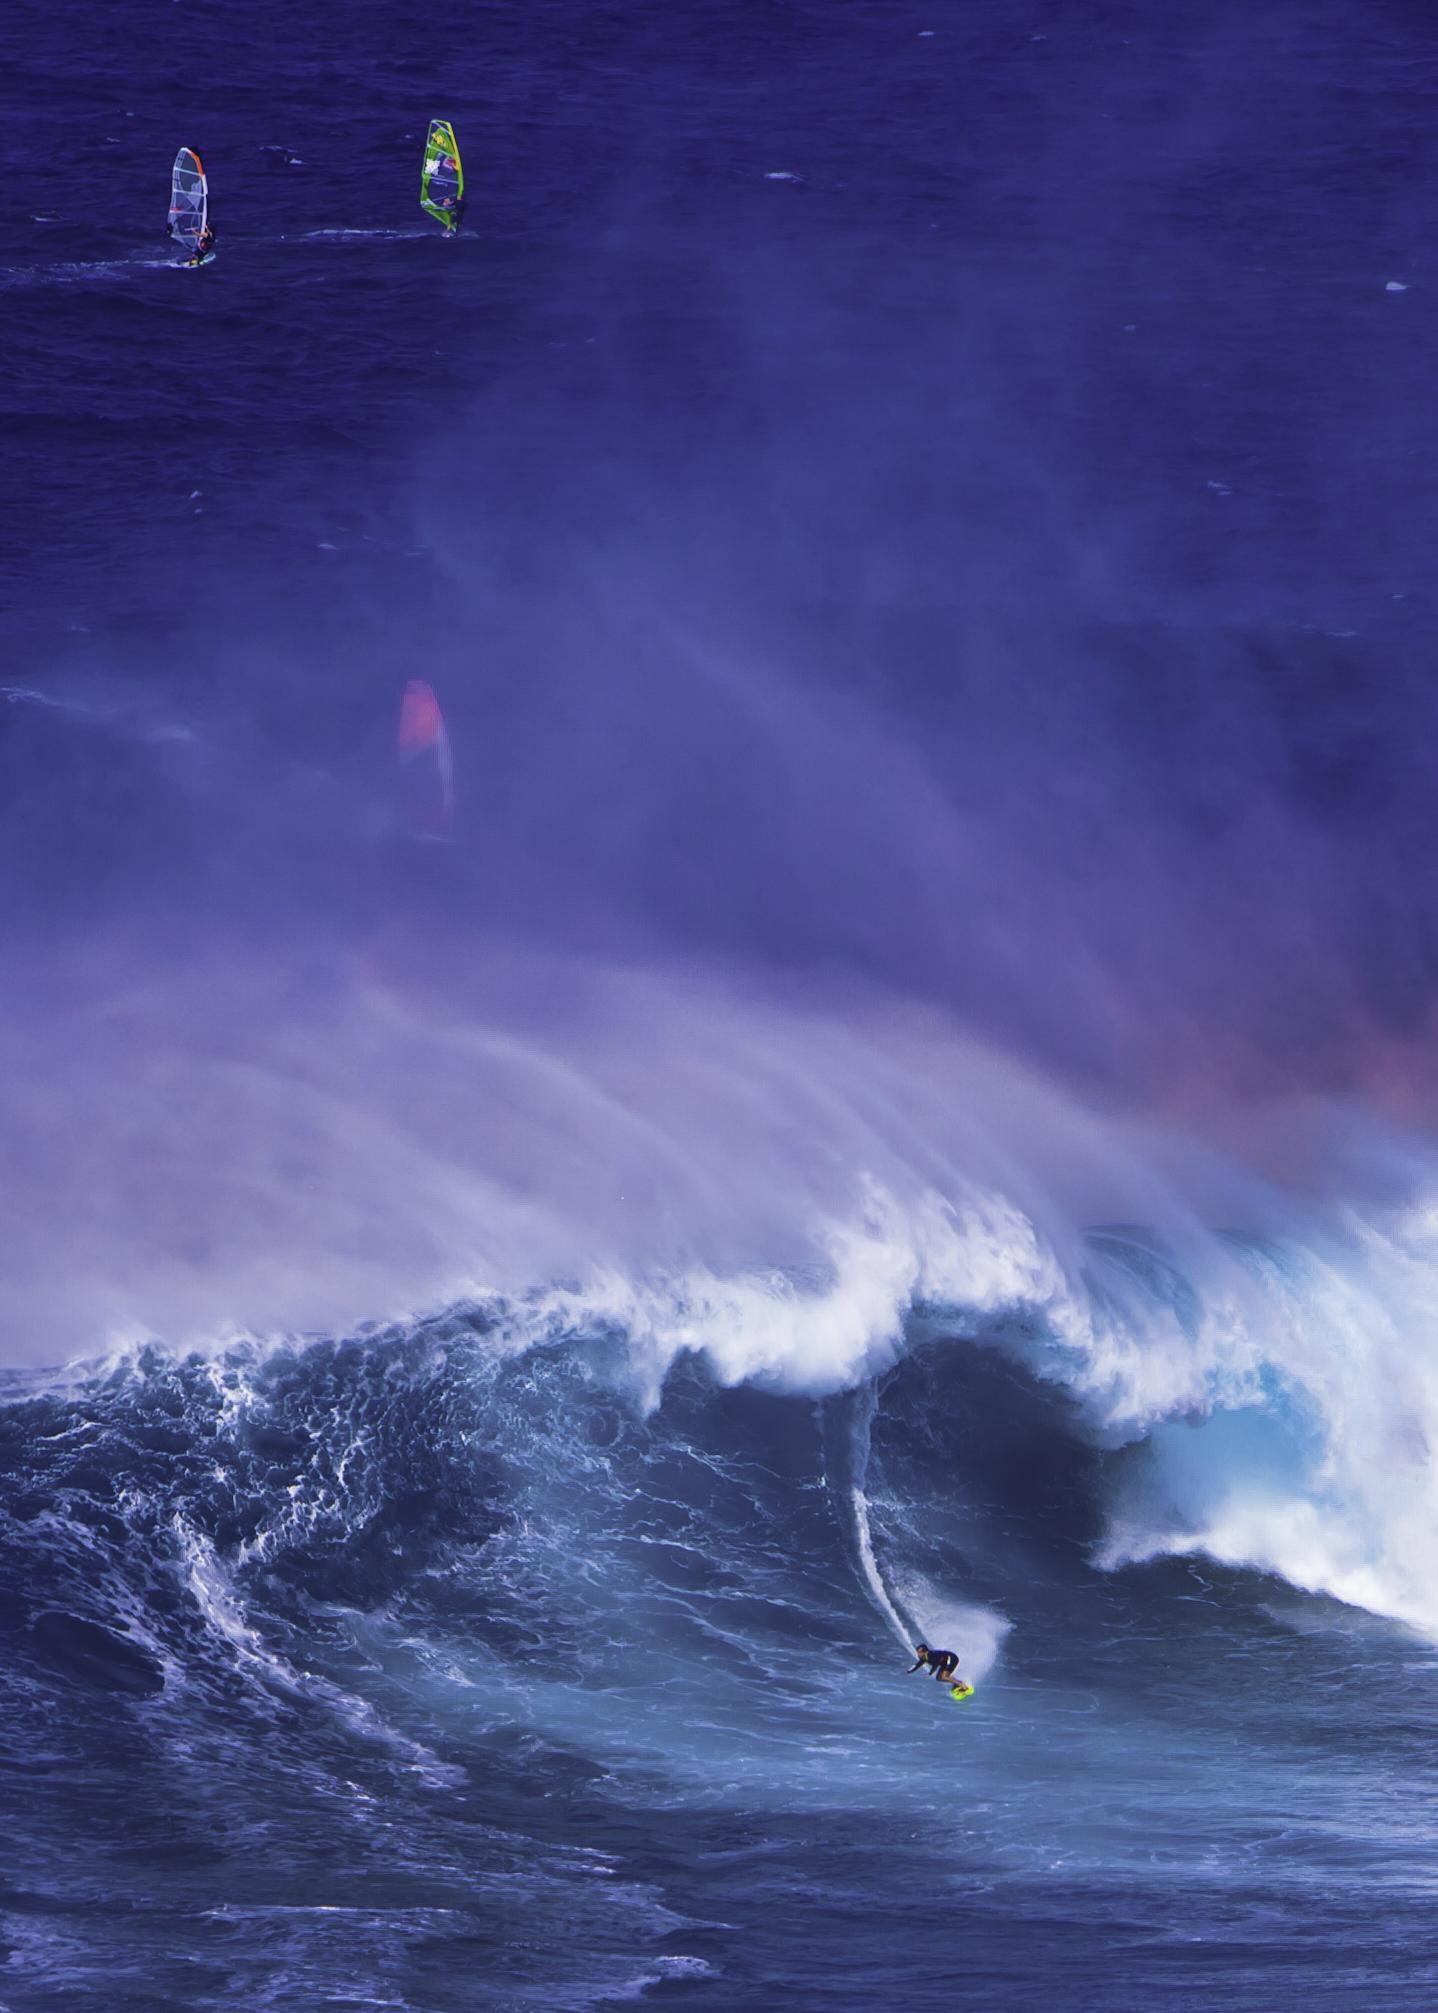 La Plus Grande Vague Du Monde Tsunami : grande, vague, monde, tsunami, Grosses, Vagues, Wikipédia